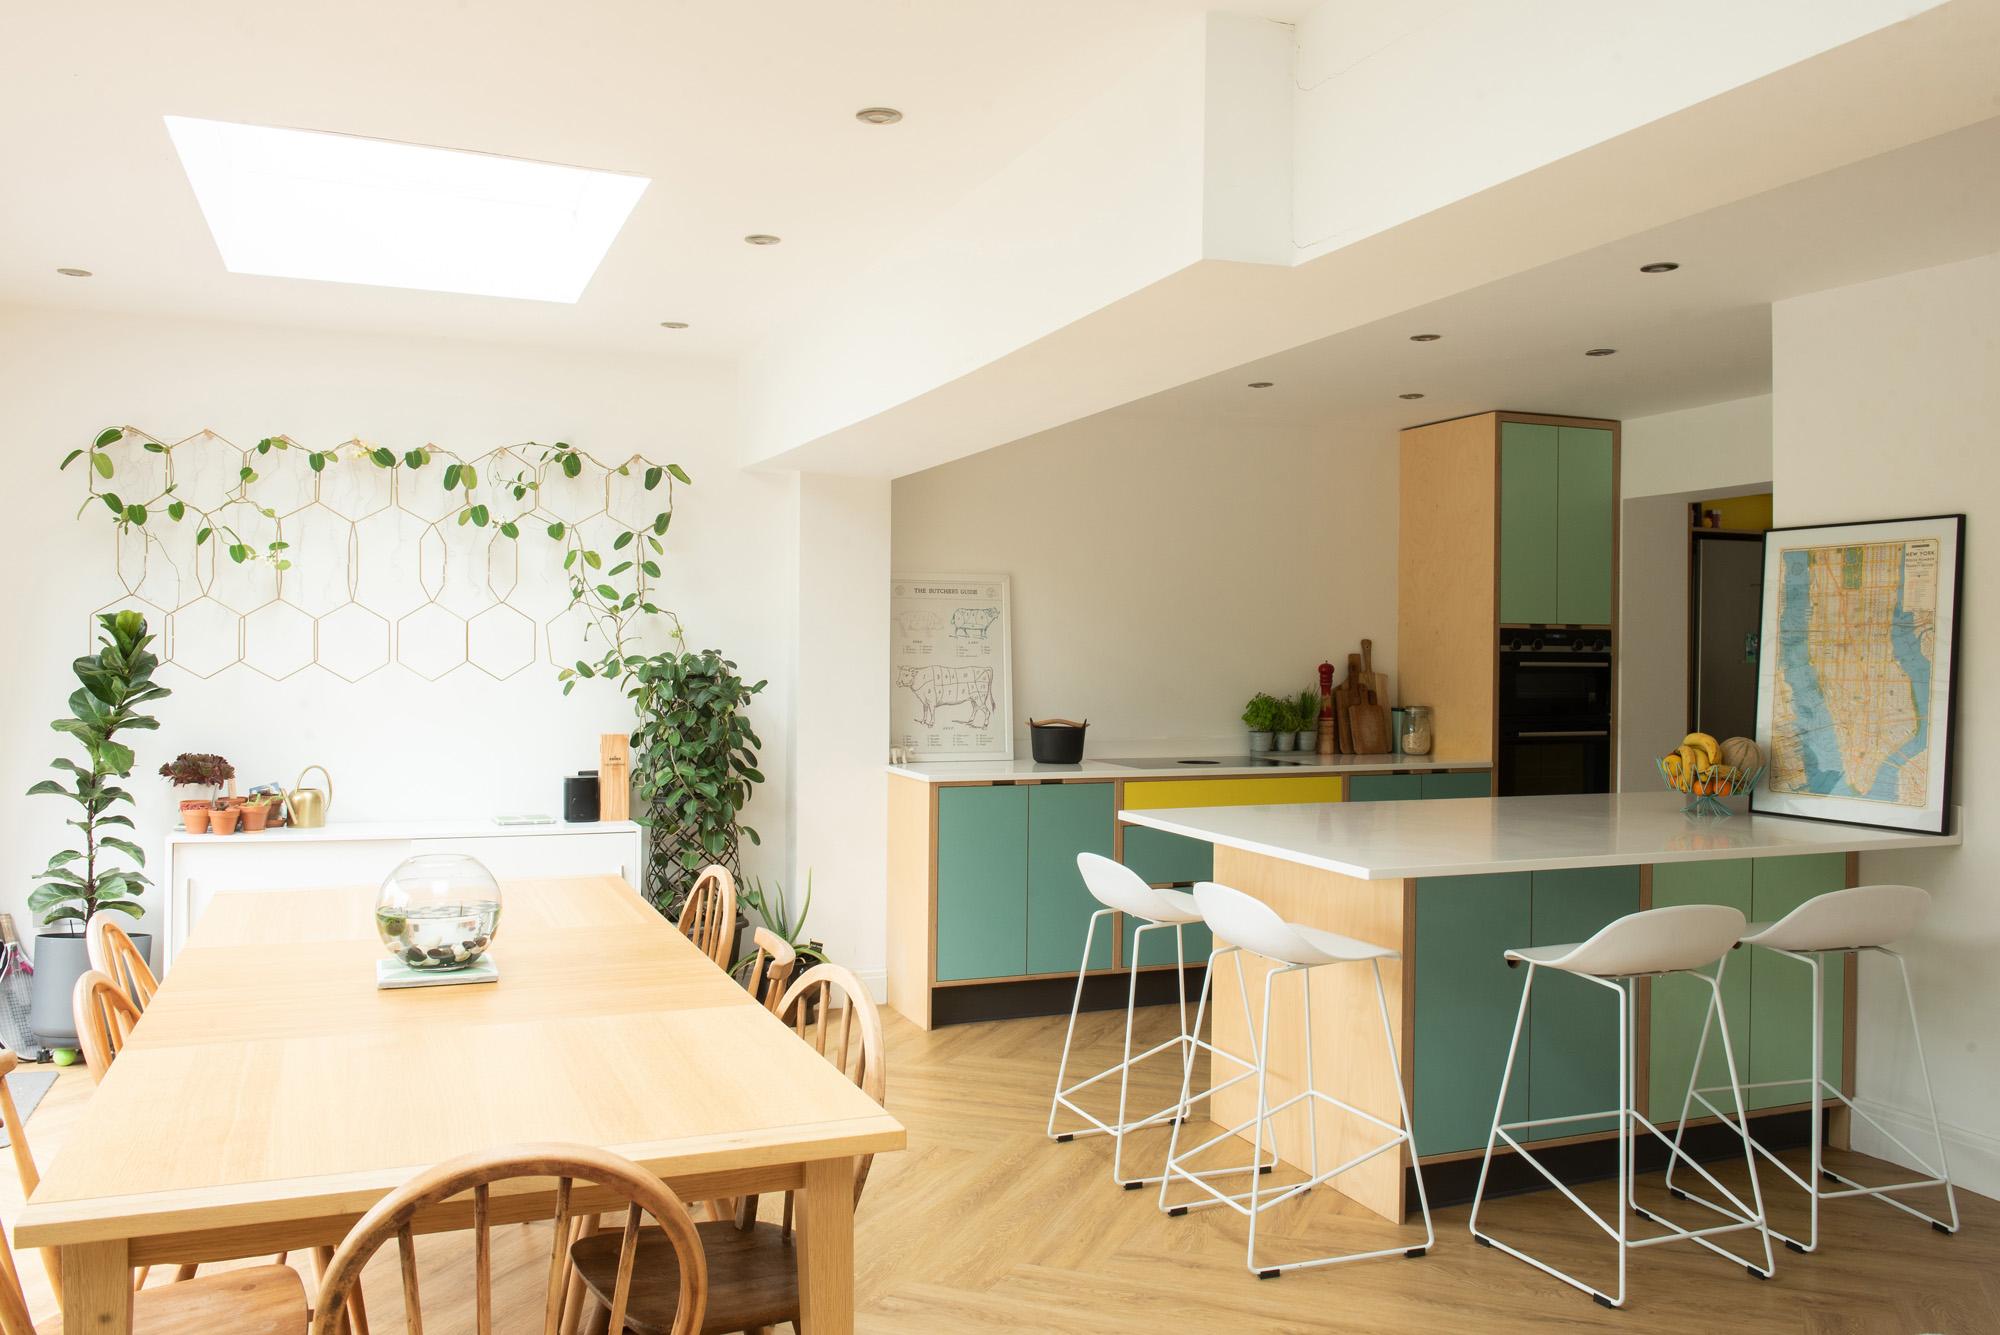 Mint green plywood kitchen